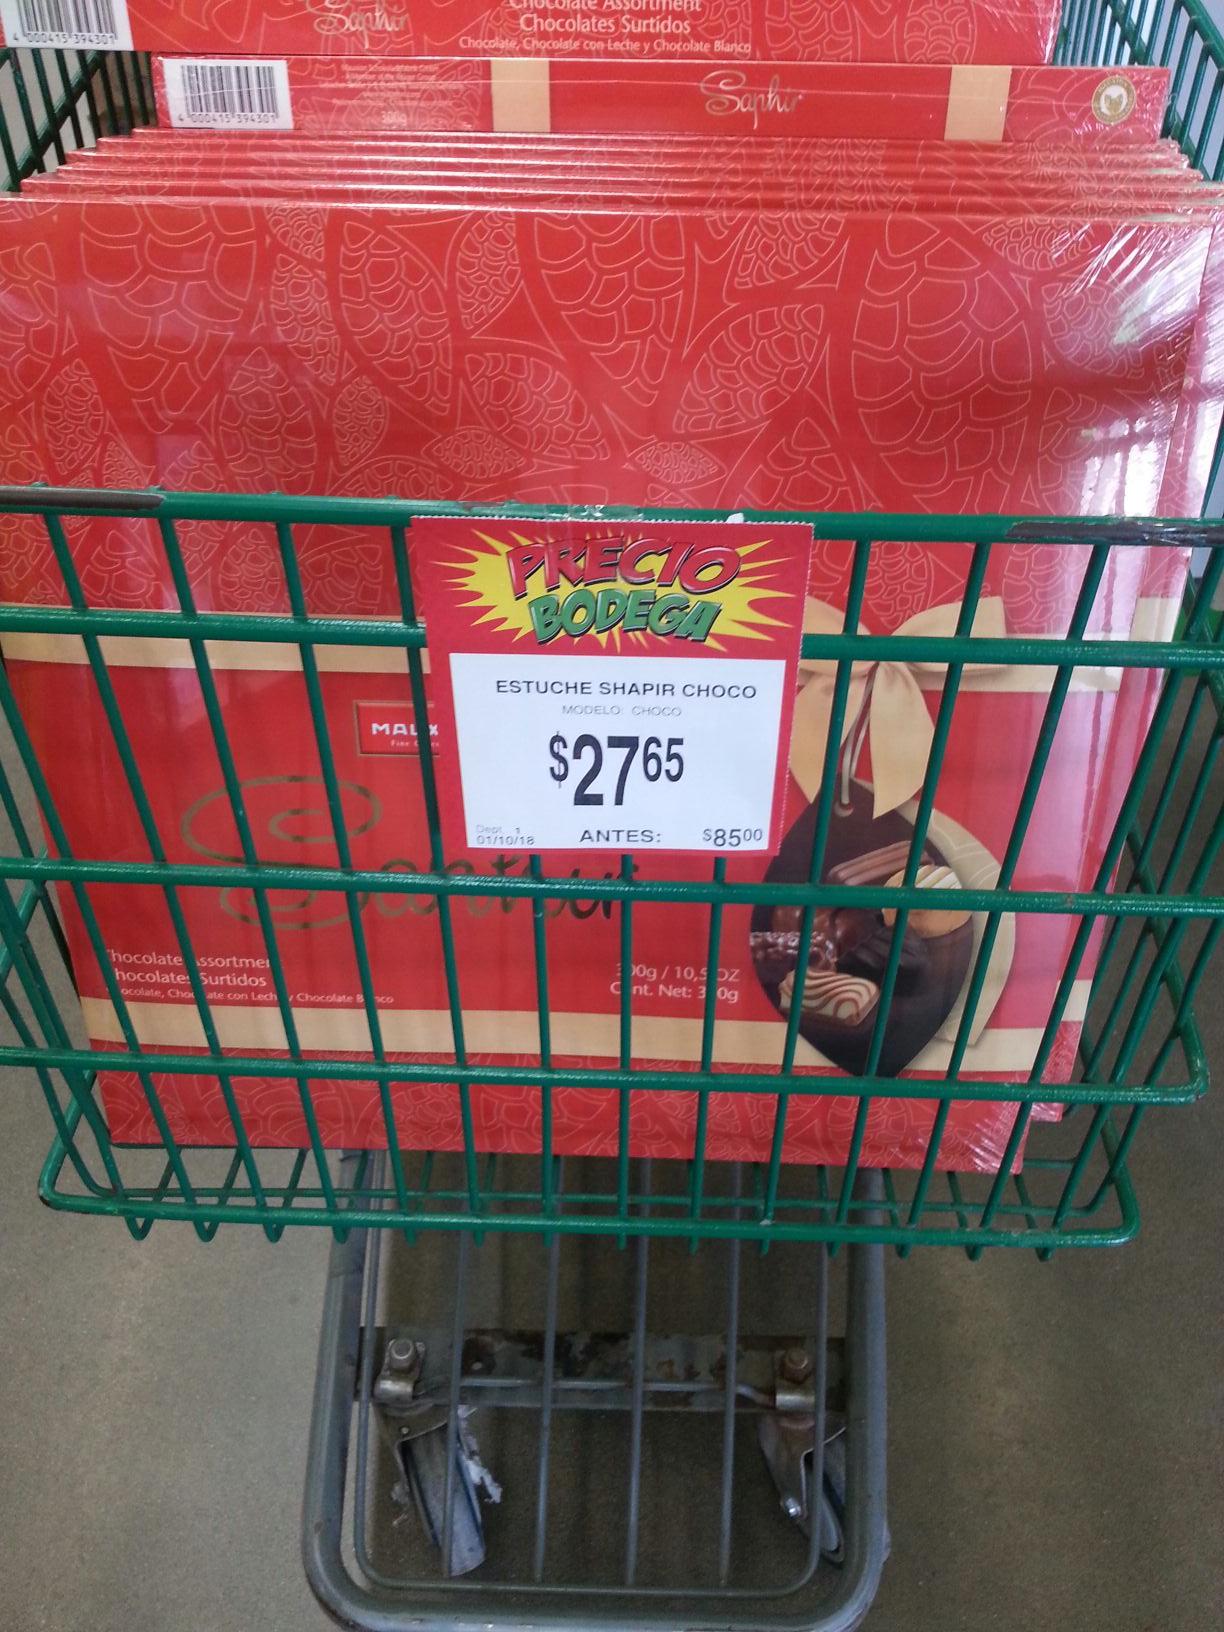 Bodega Aurrerá 3rios Culiacan: caja chocolate saphir de $ 85 a $ 27.65